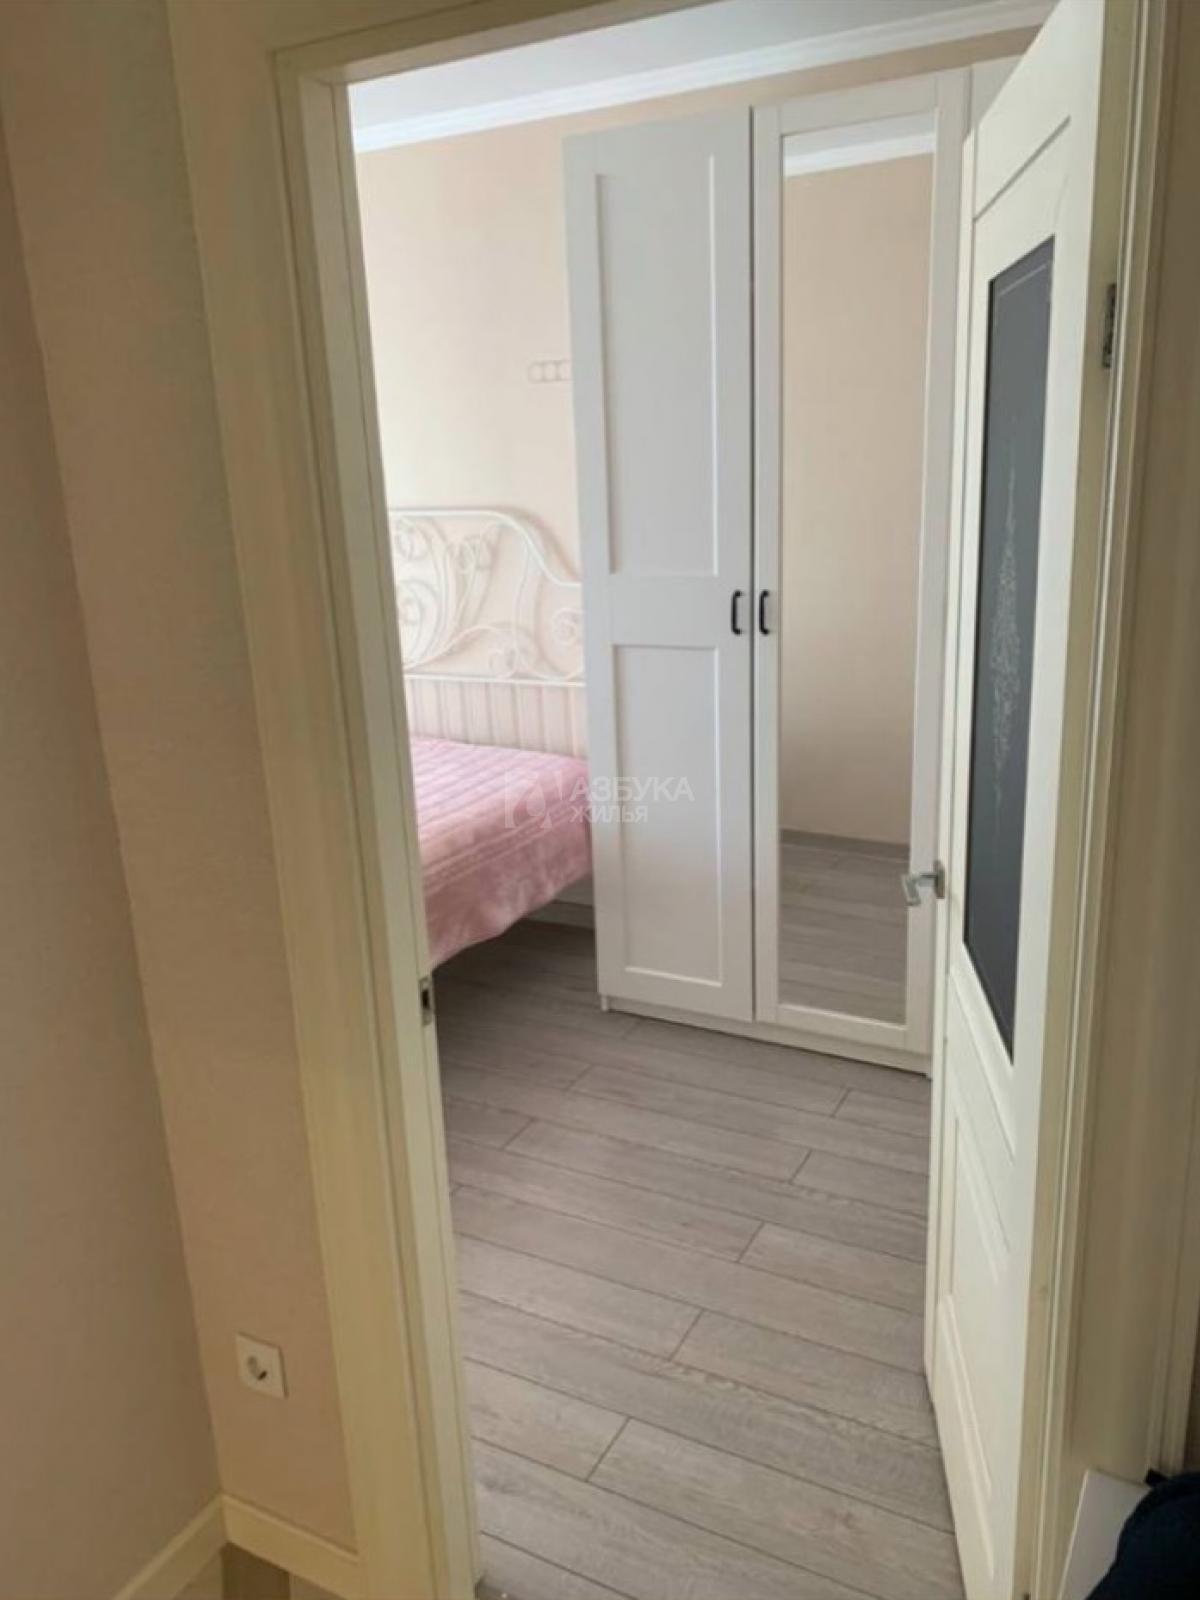 Фото №8 - 2-комнатная квартира, Люберцы, Камова улица 9 корпус 2, метро Некрасовка